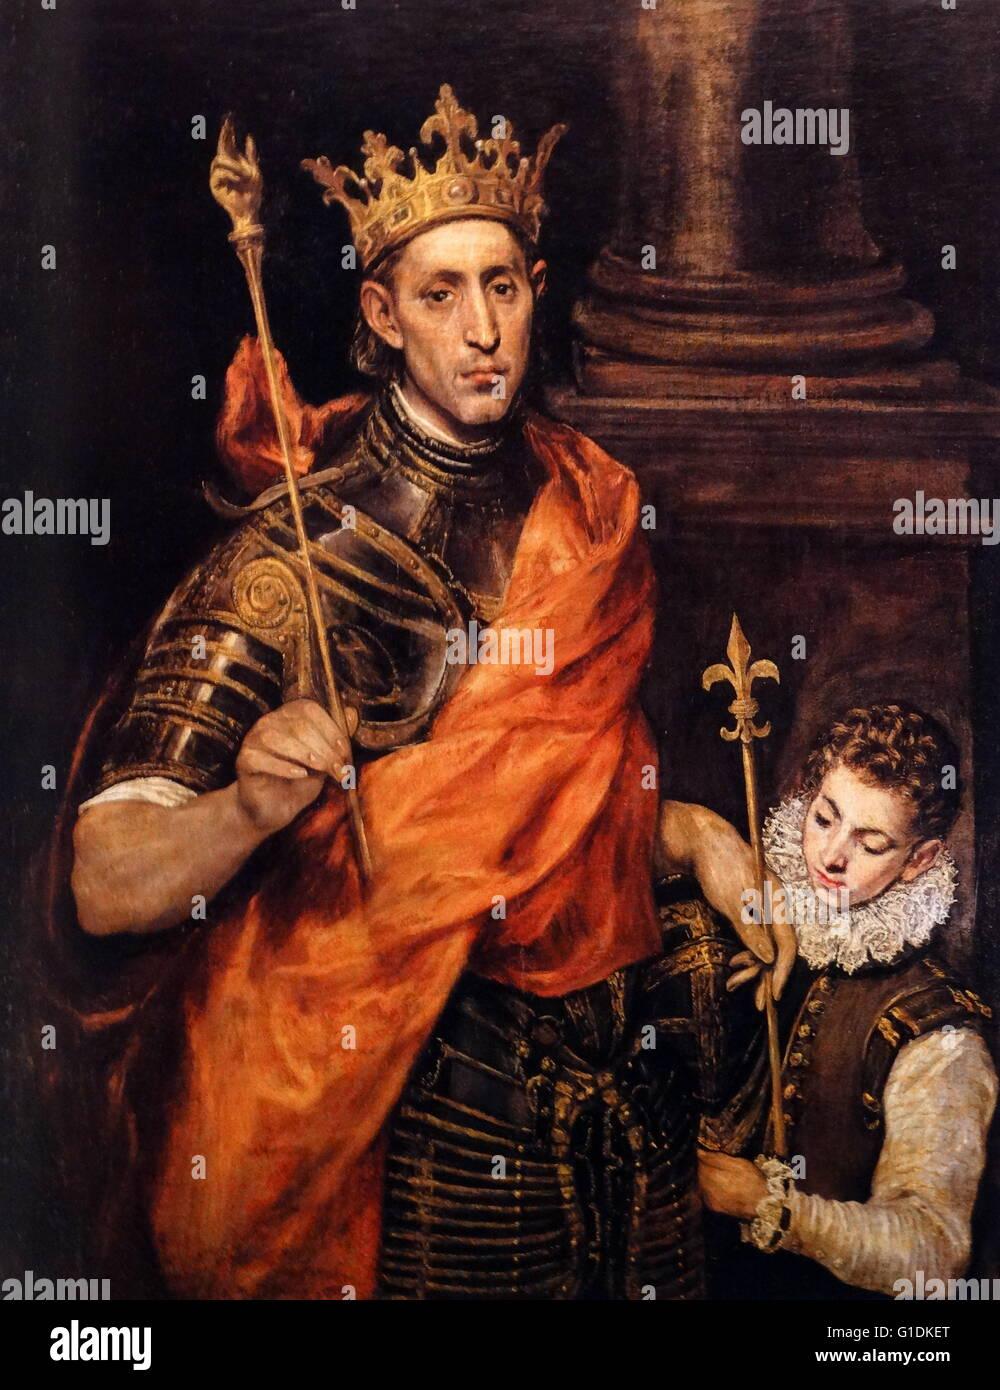 "Pintura titulada ""SAINT-LOUIS, Rey de Francia' de El Greco Foto de stock"